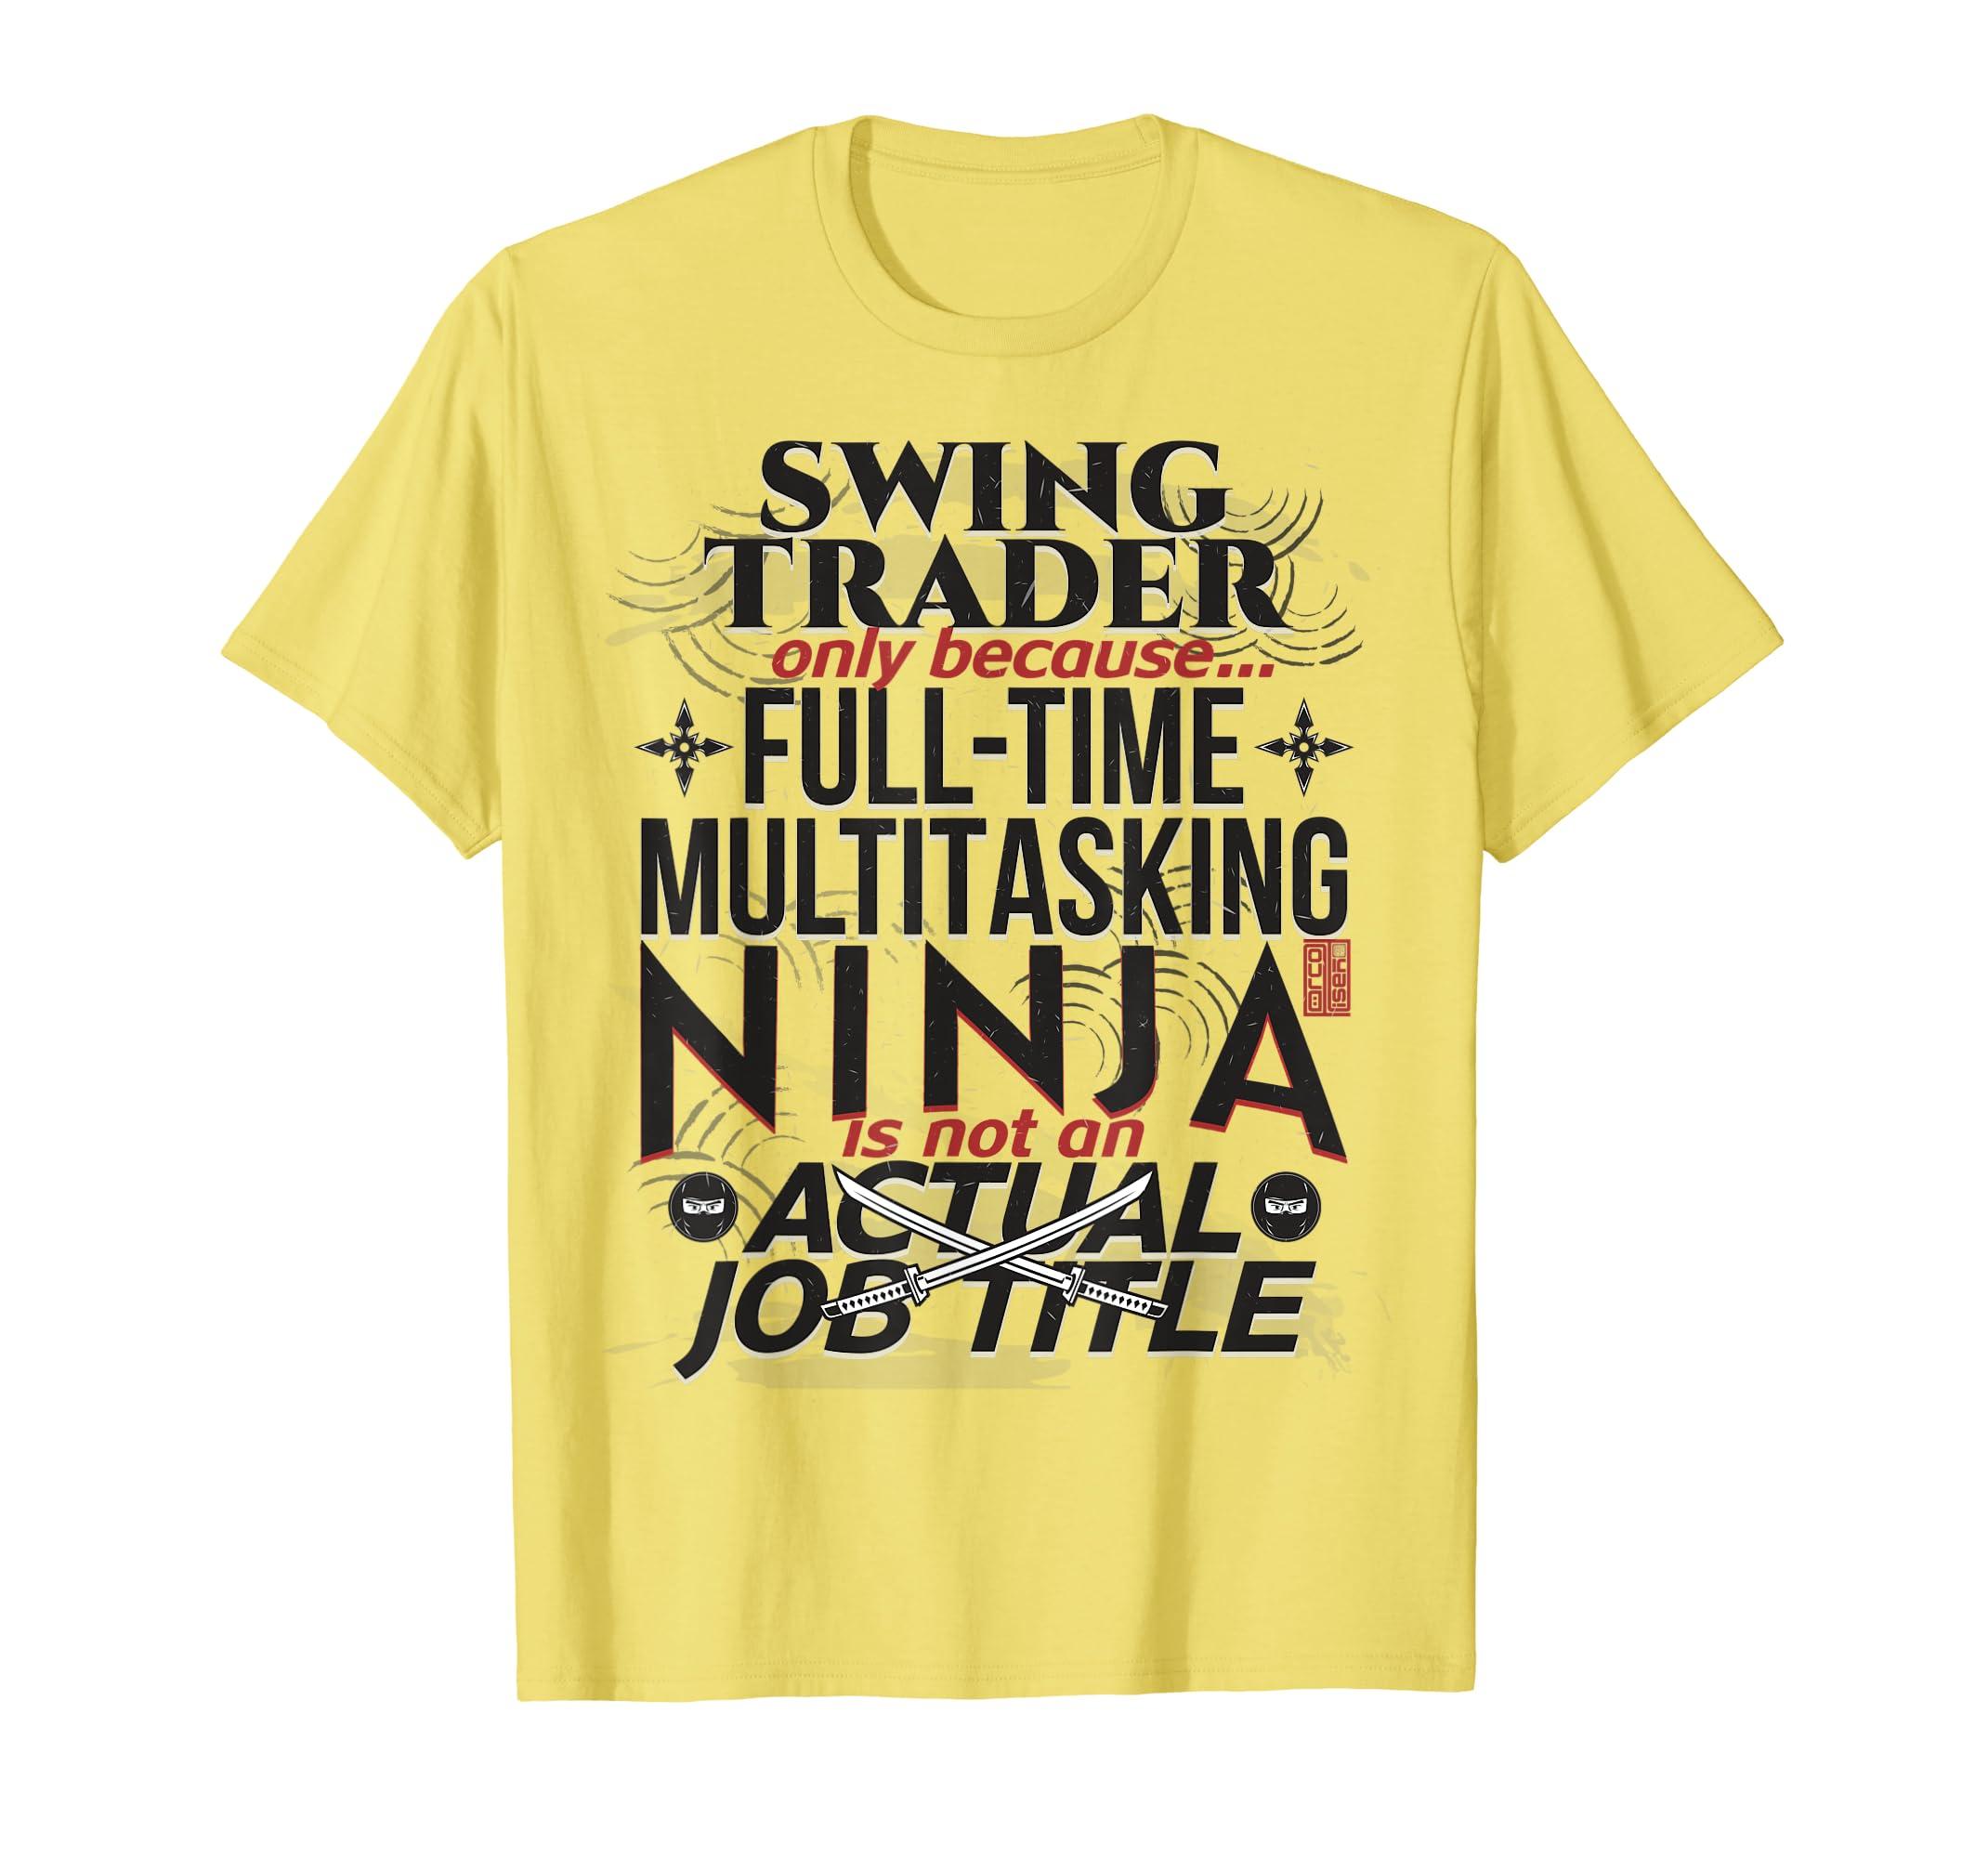 Amazon.com: SWING TRADER FULL-TIME MULTITASK NINJA JOB TITLE ...